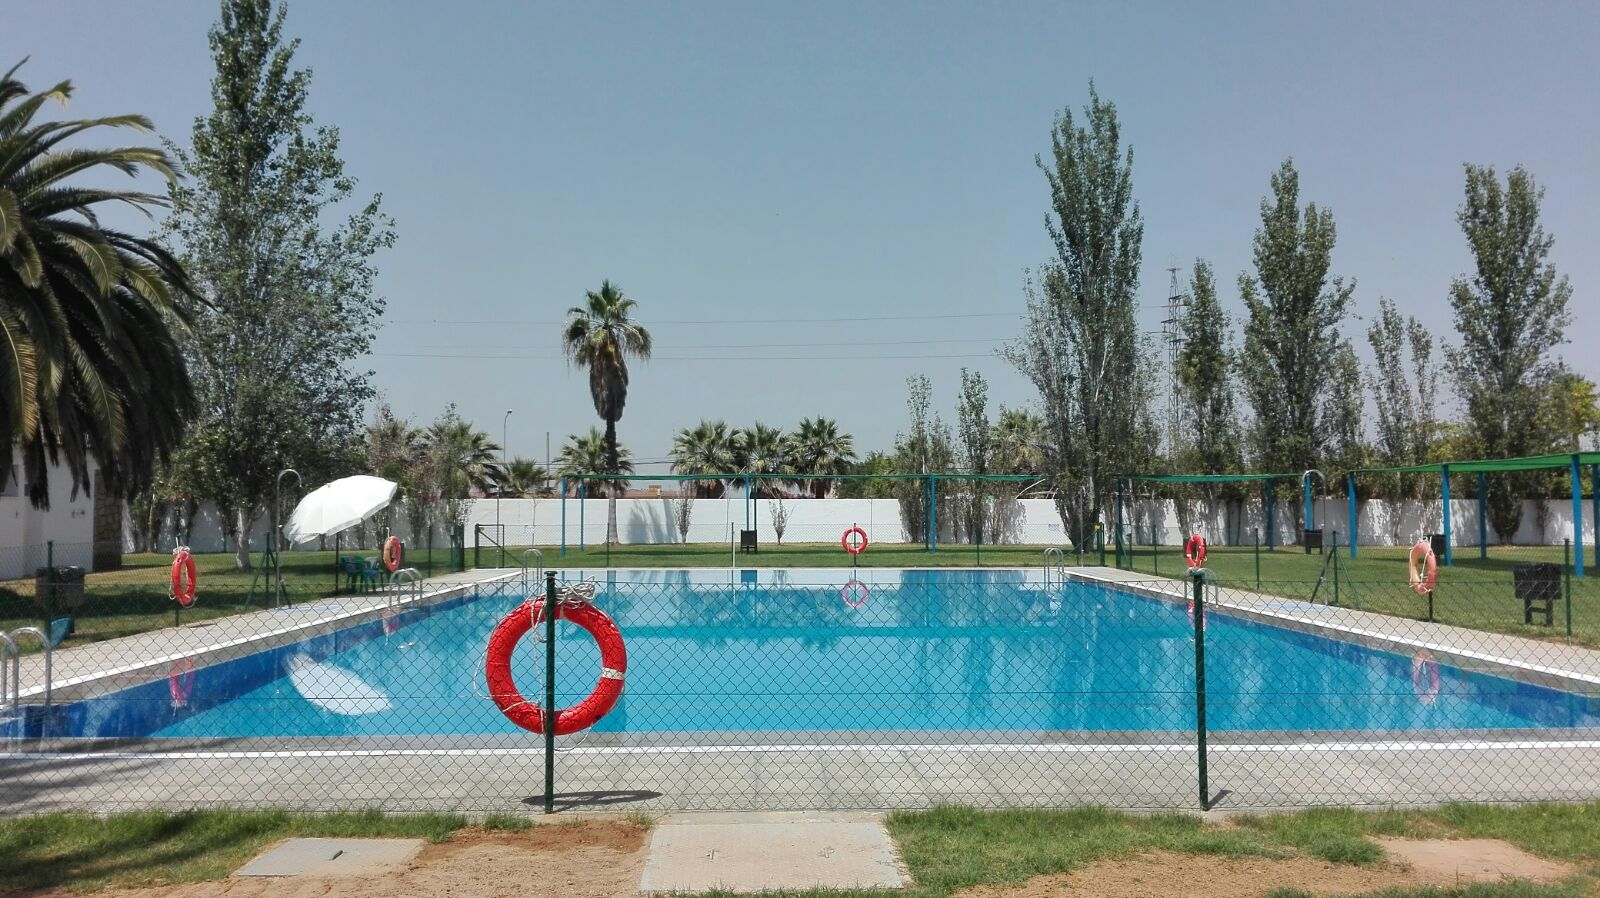 Inaugurada la nueva temporada de piscina municipal for Piscinas merino